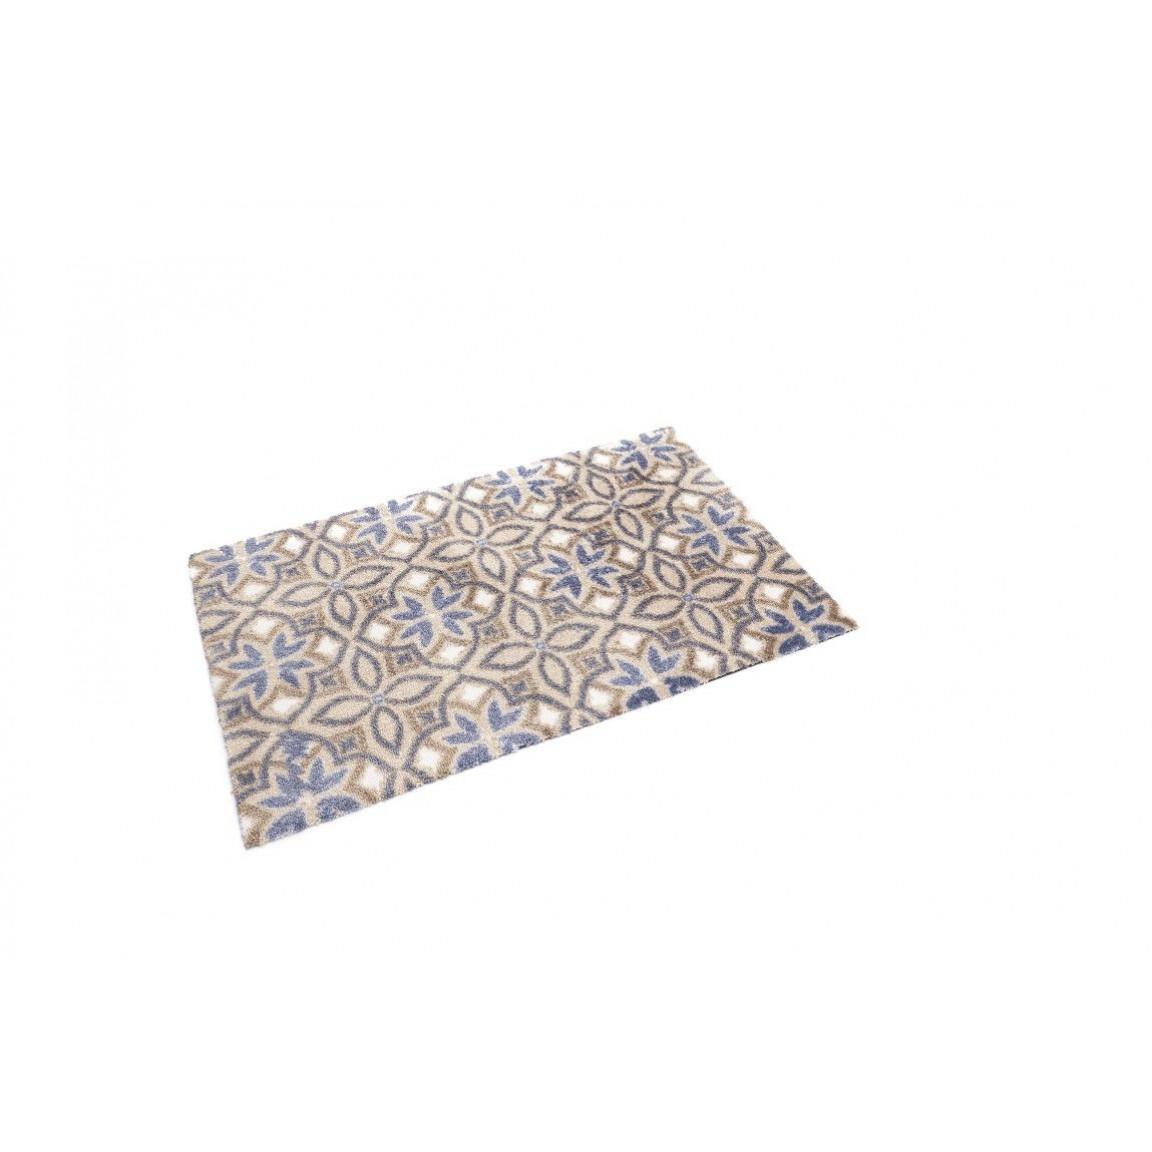 Fußmatte Thelma Scraper | 50 x 75 cm